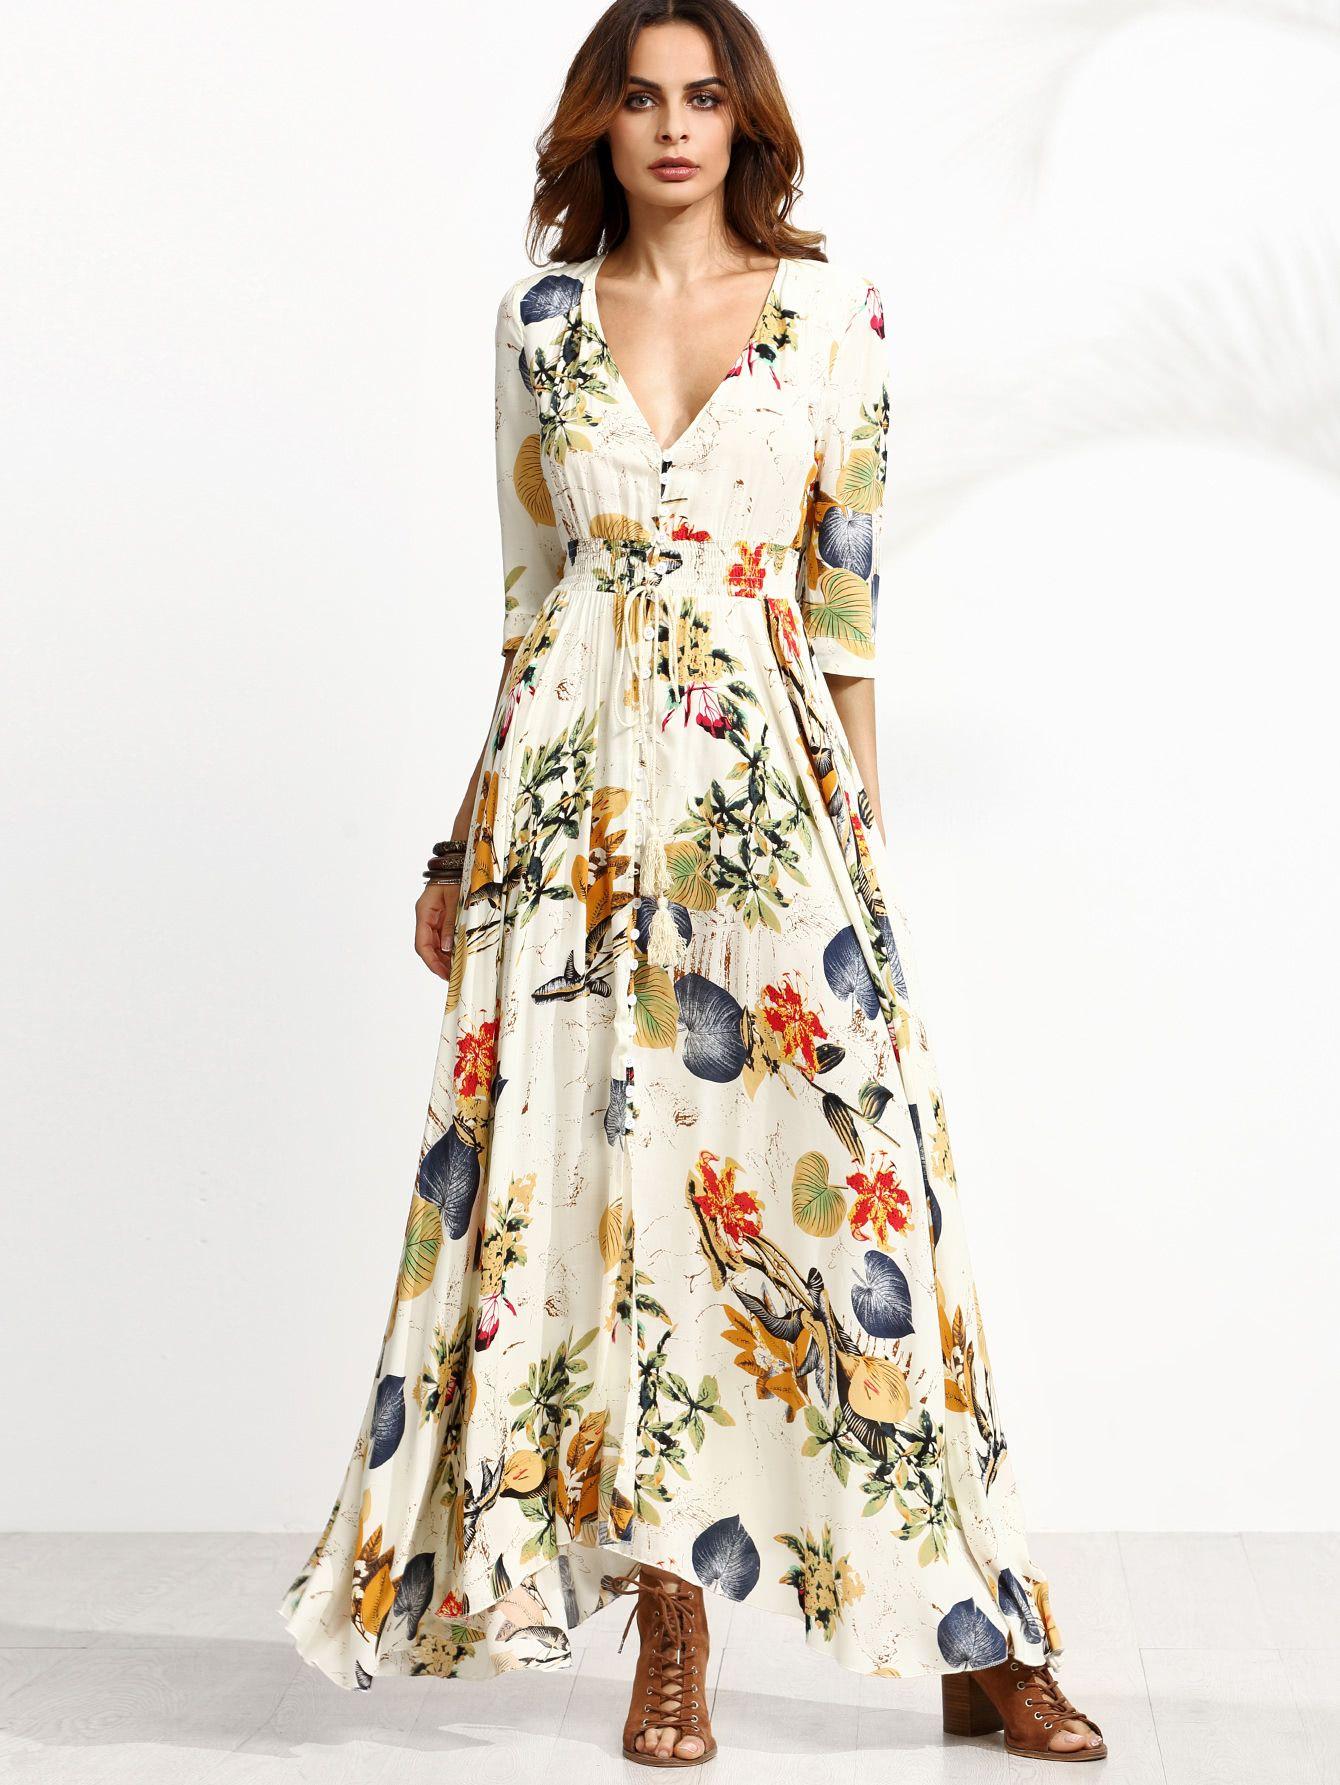 60324b0a6 Vestido escote V profundo con estampado floral-Spanish Romwe Sitio Móvil